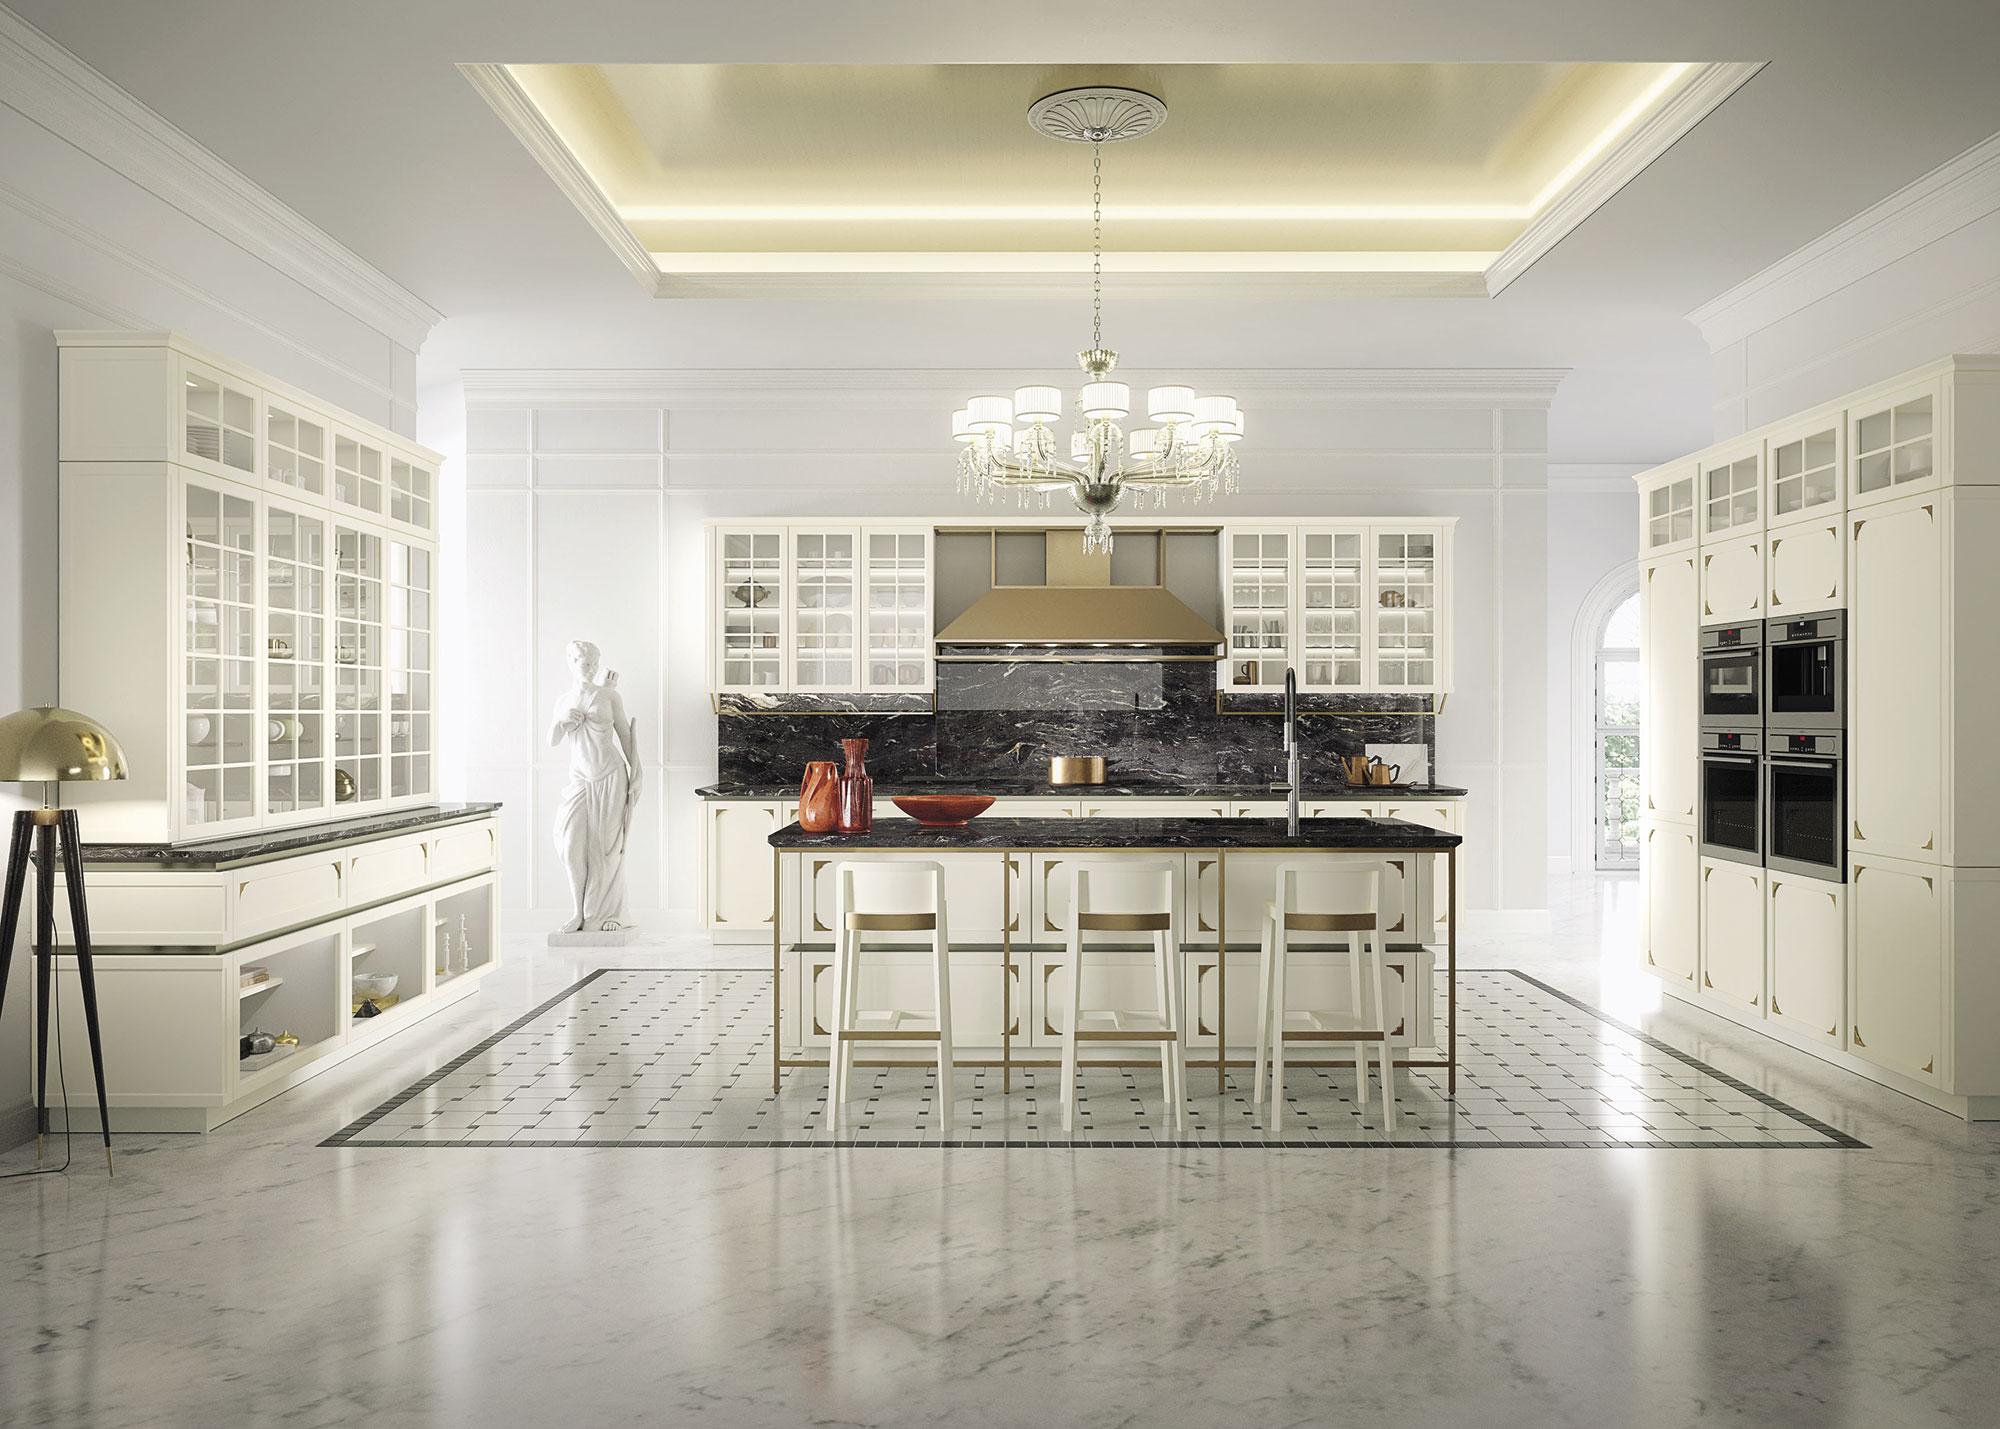 cucina-Kelly-bianco-luce-1.jpg